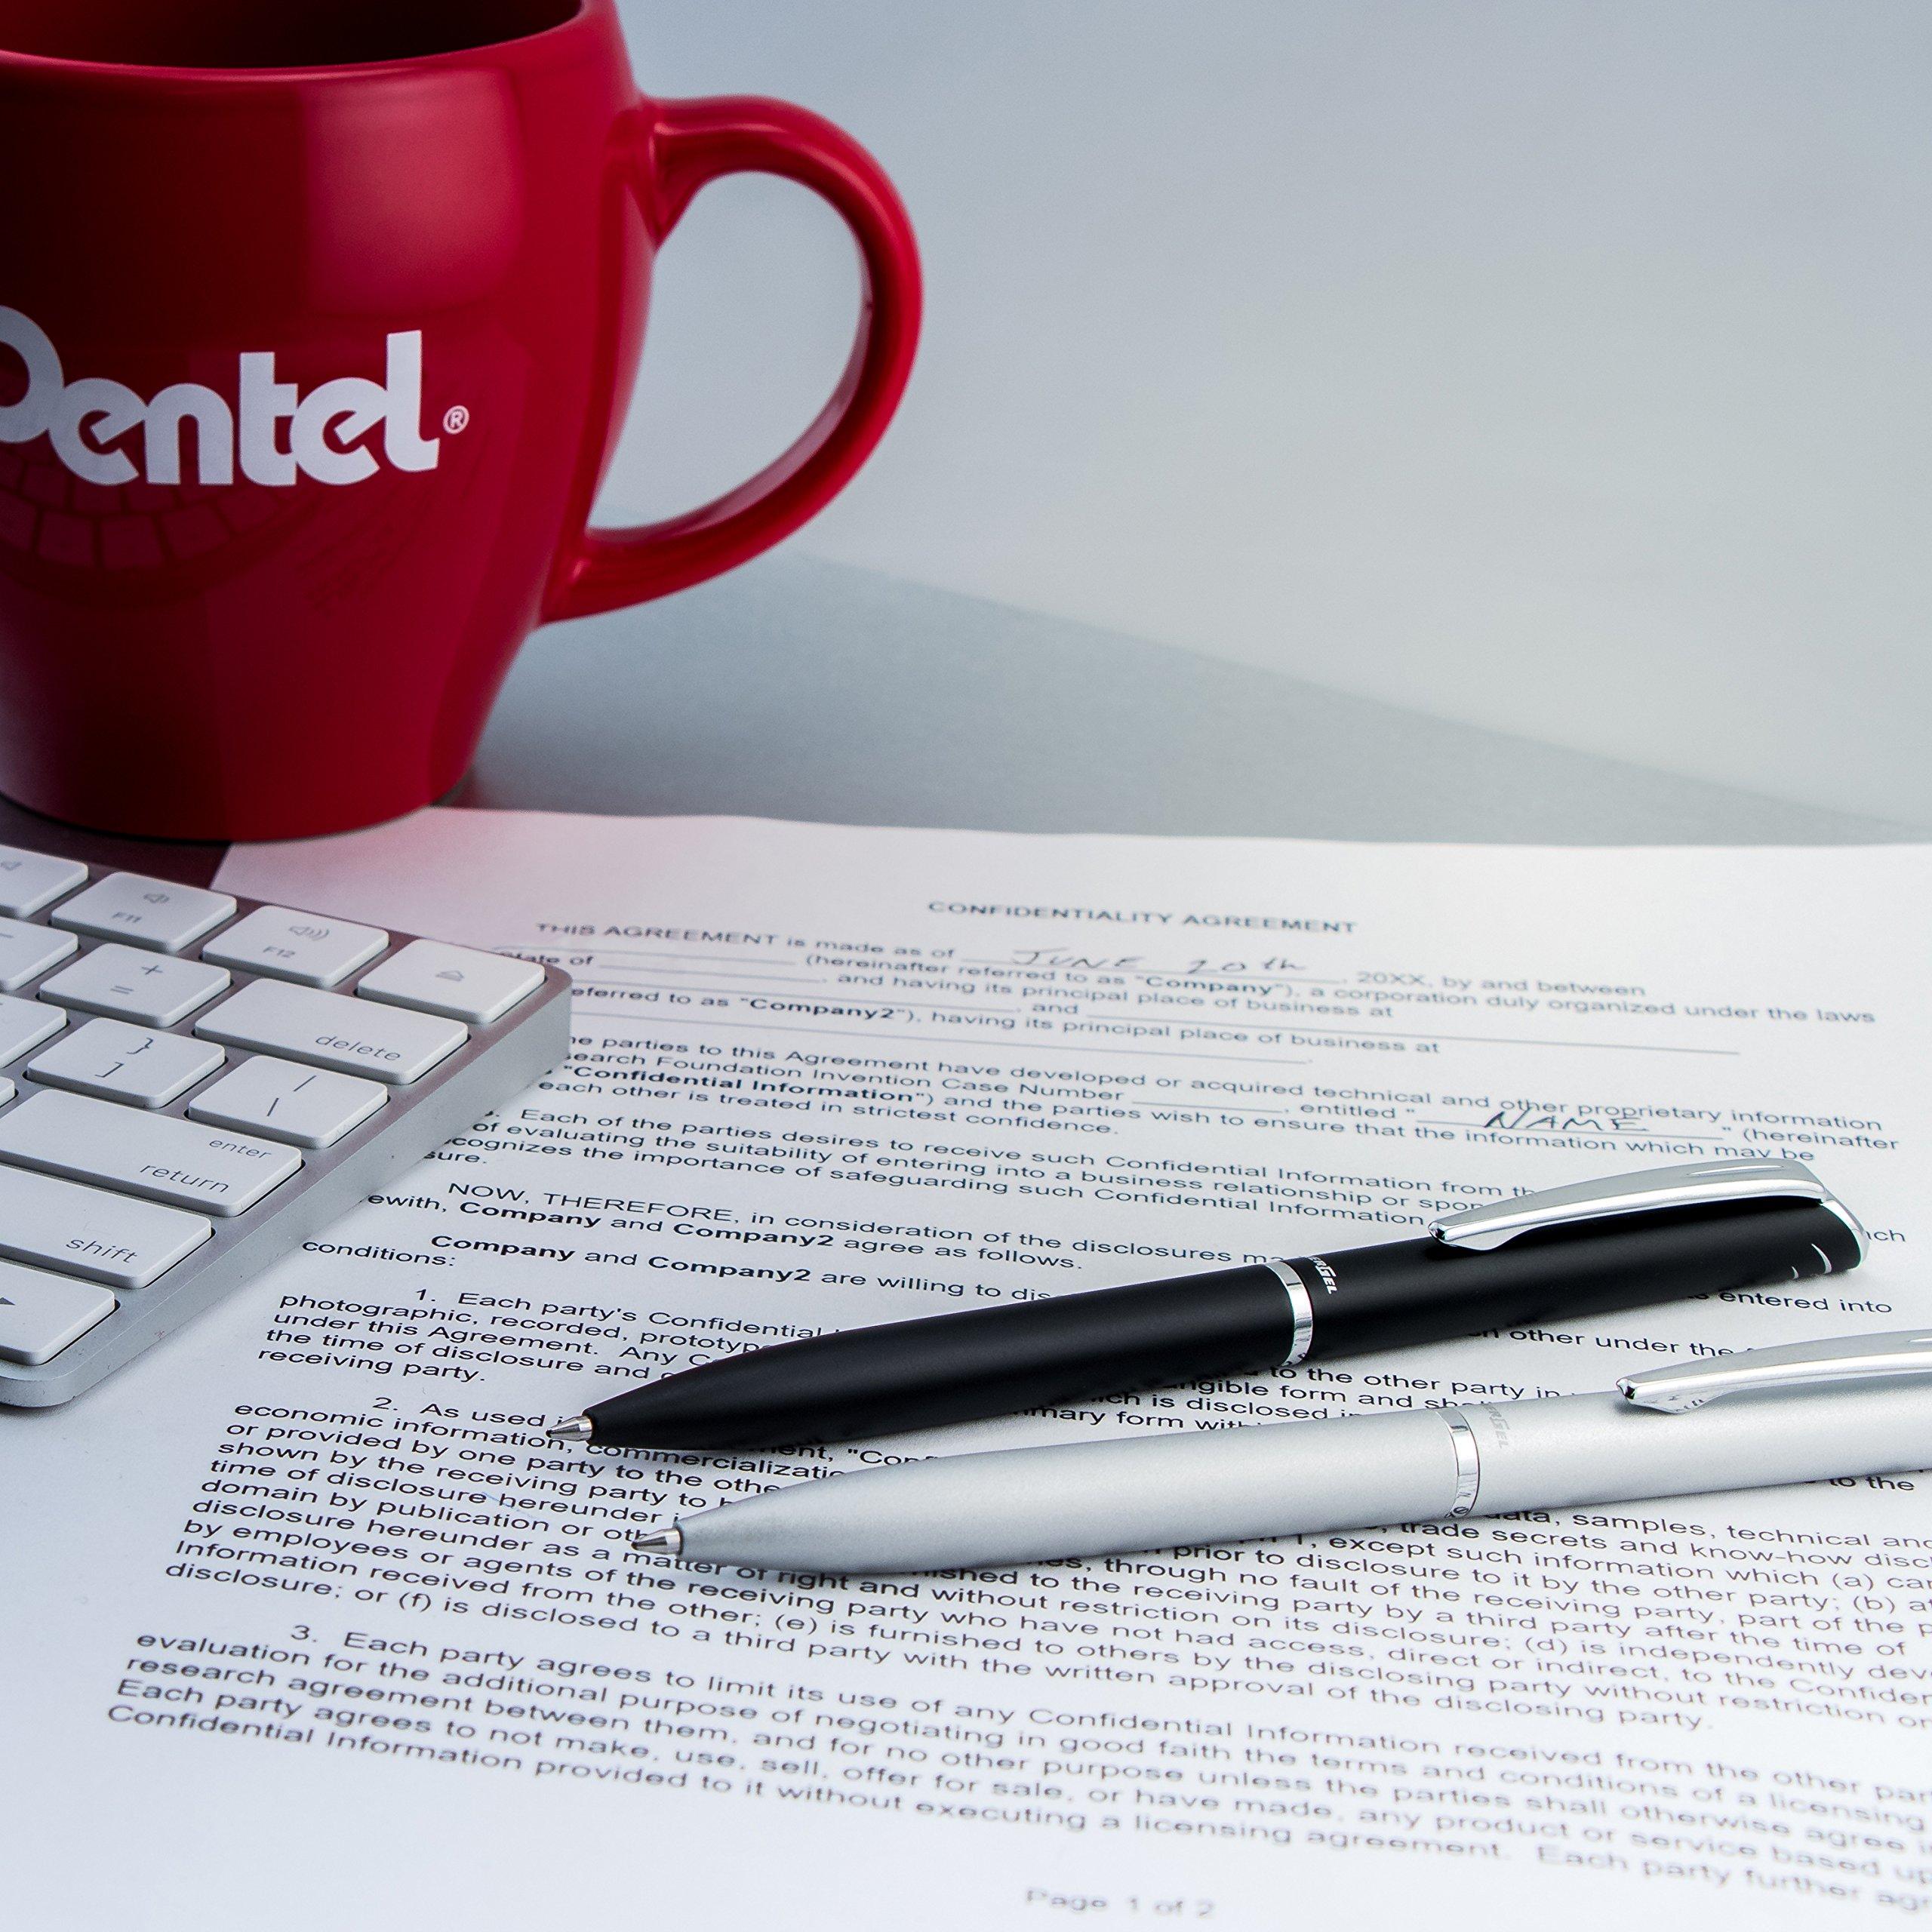 Pentel EnerGel Style Gel Pen, (0.7mm) Medium Line,Teal Blue Barrel - BL2007SABX by Pentel (Image #7)